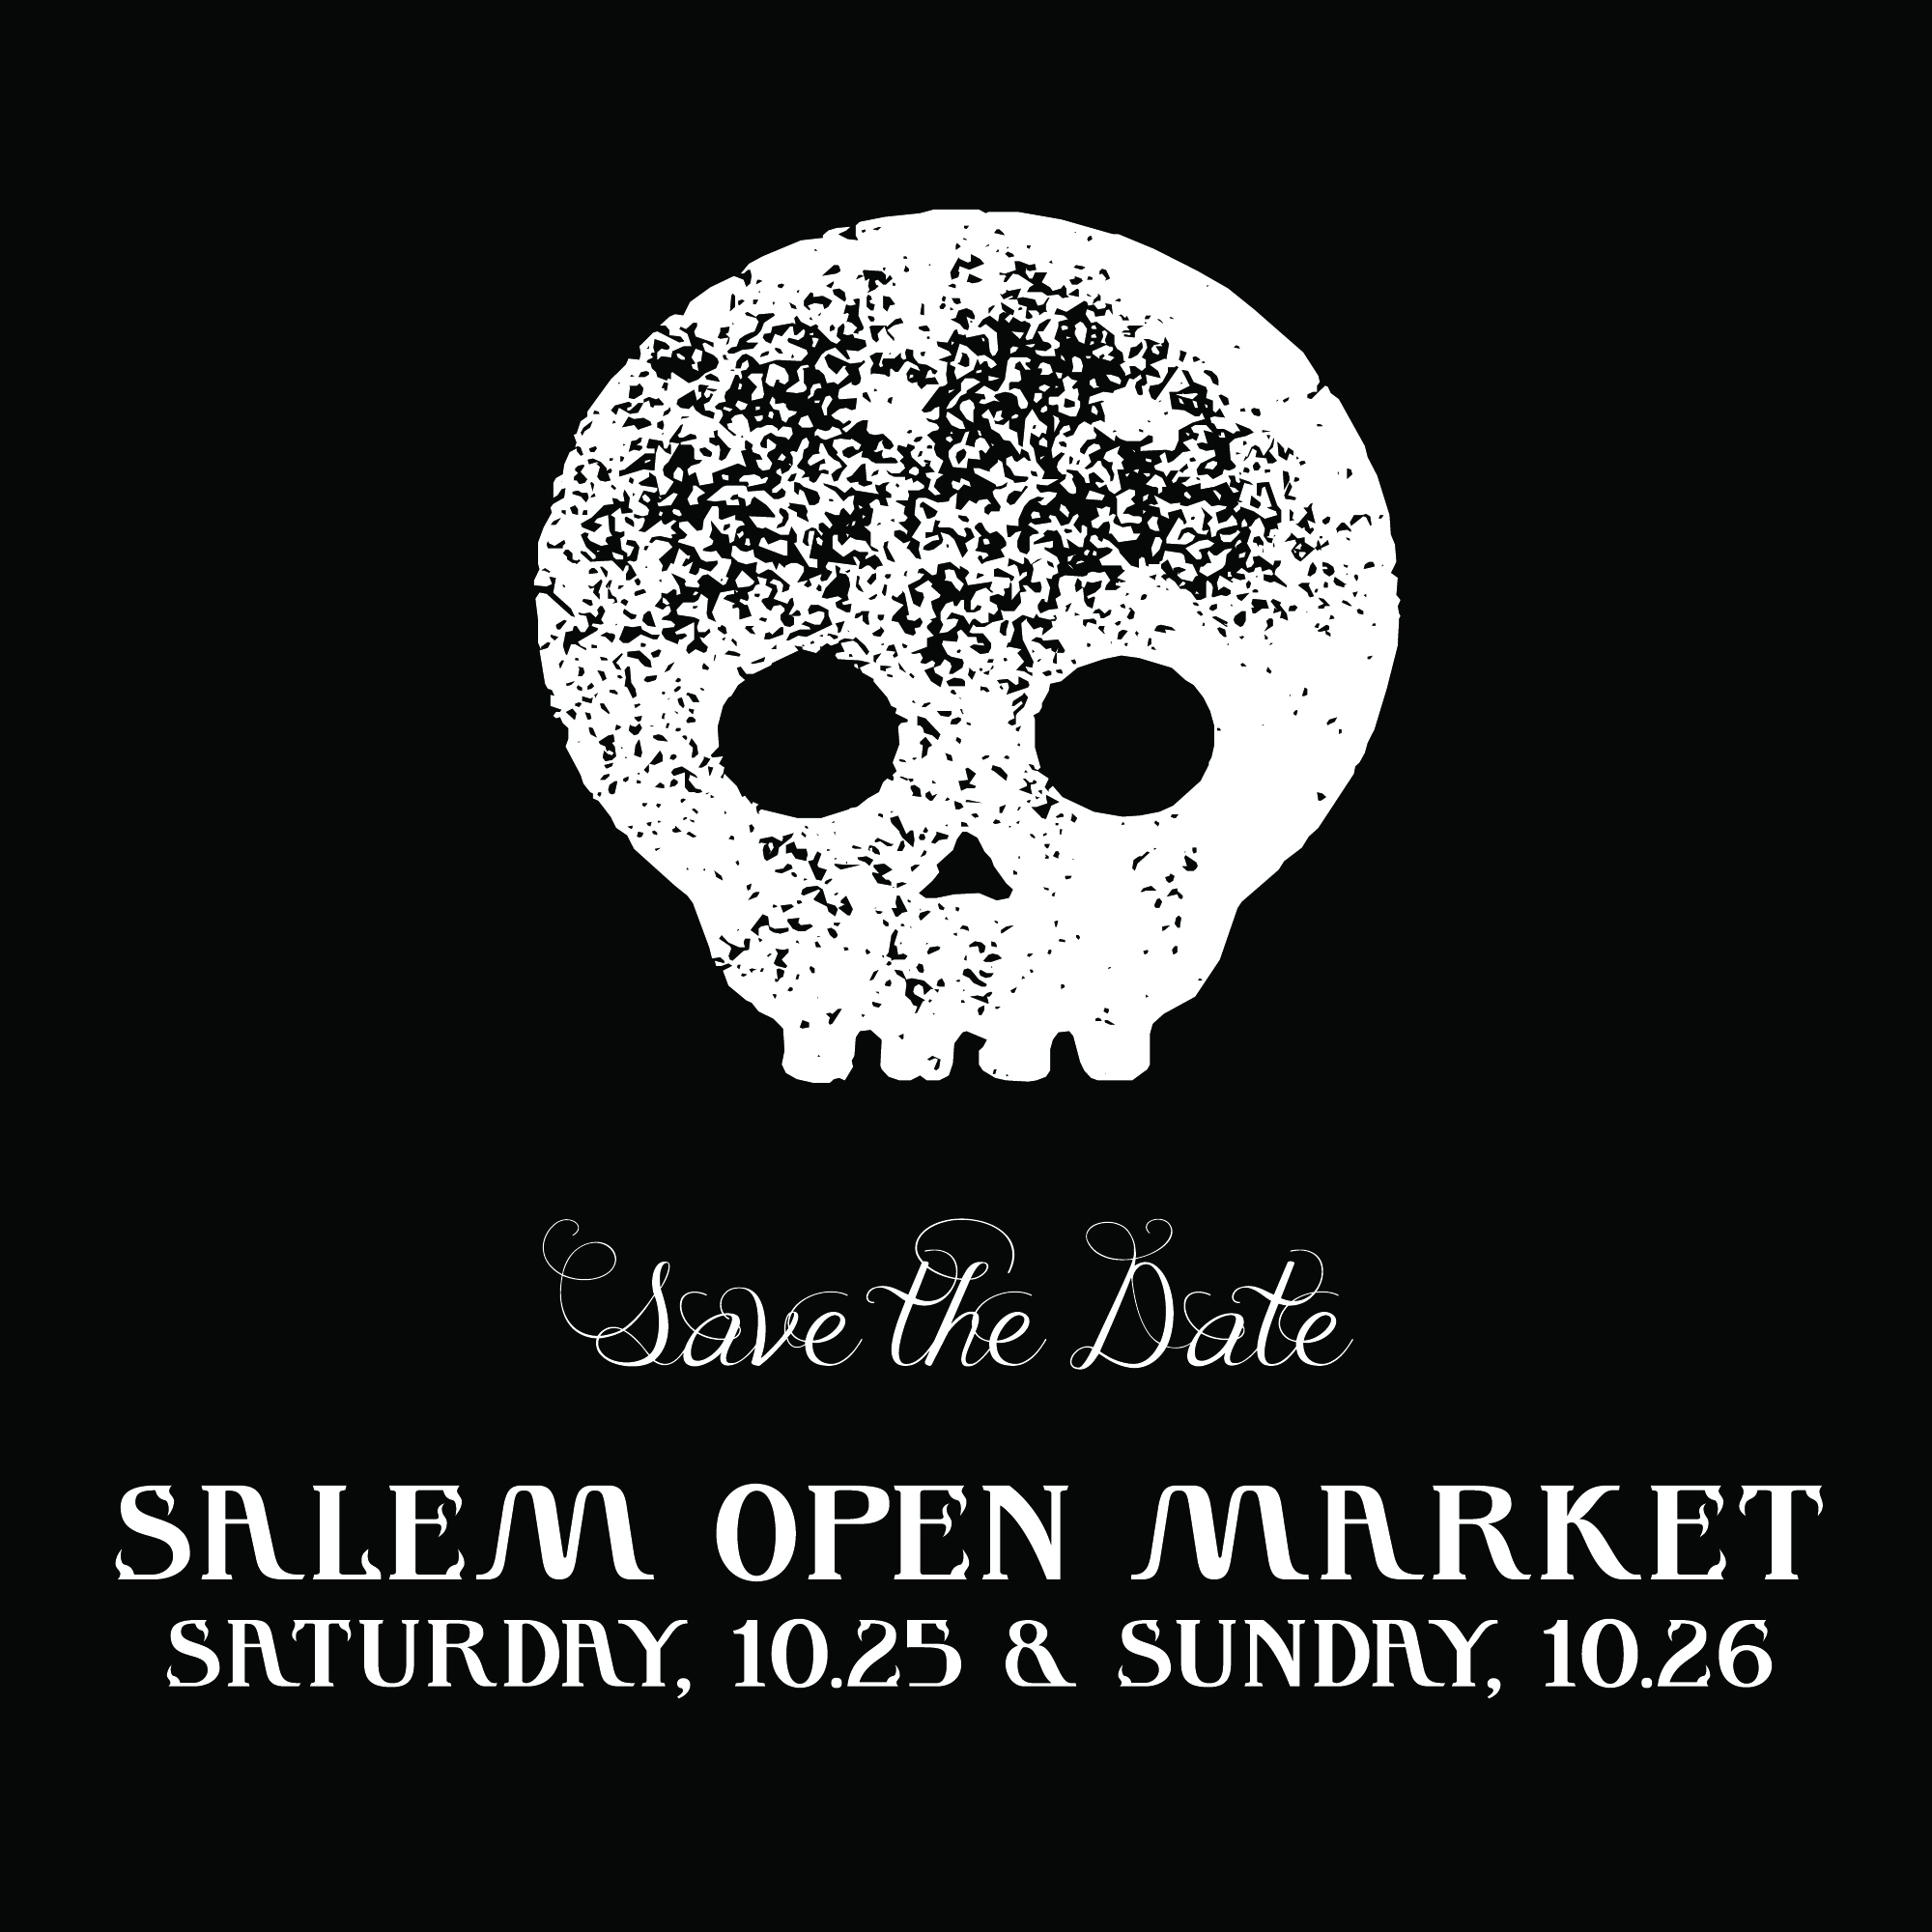 Salem Open Market